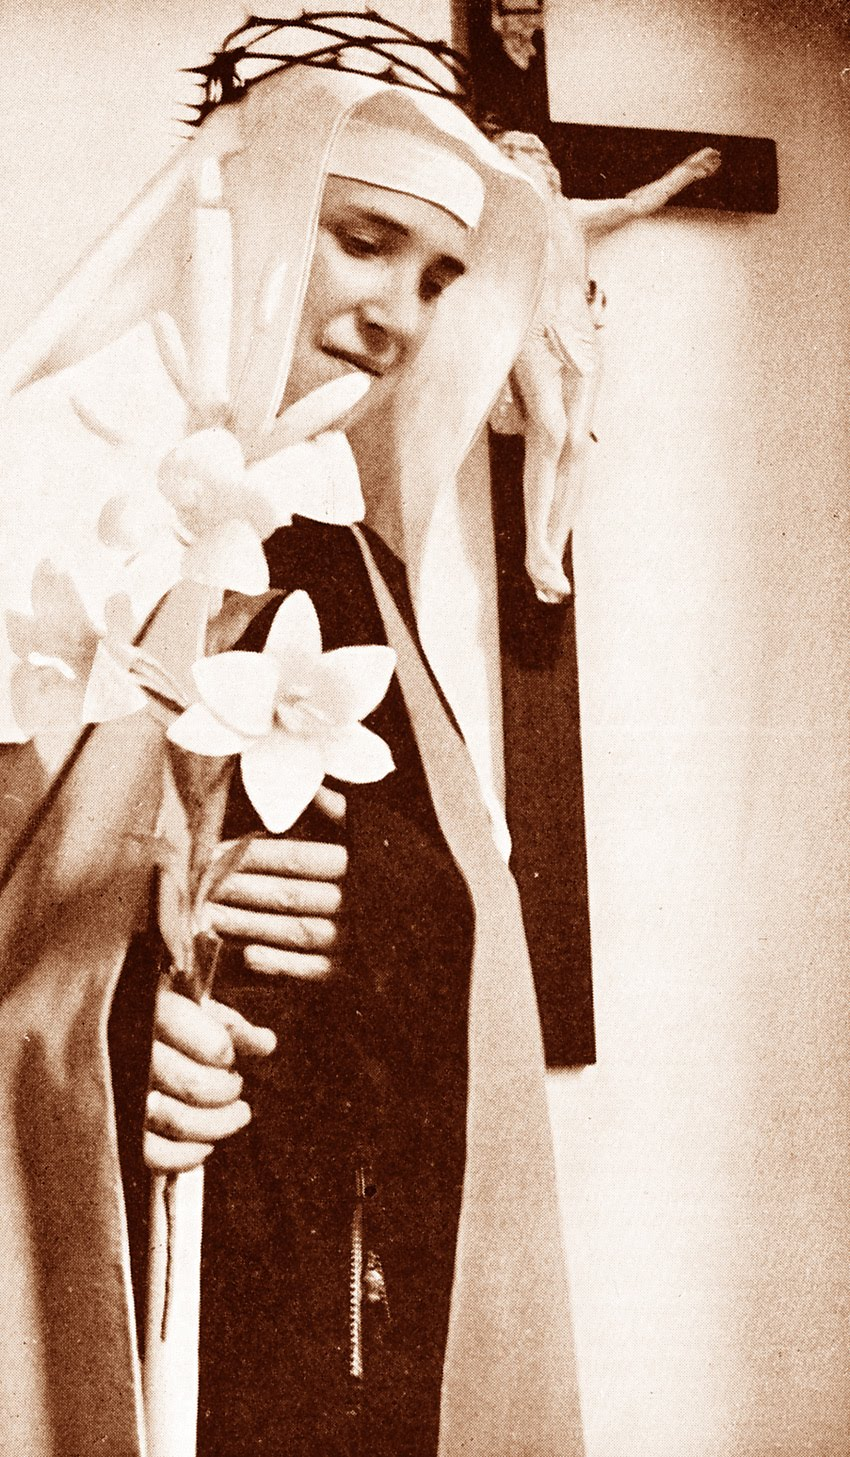 Redemptoristine+Clothing+Ceremony+3.jpg